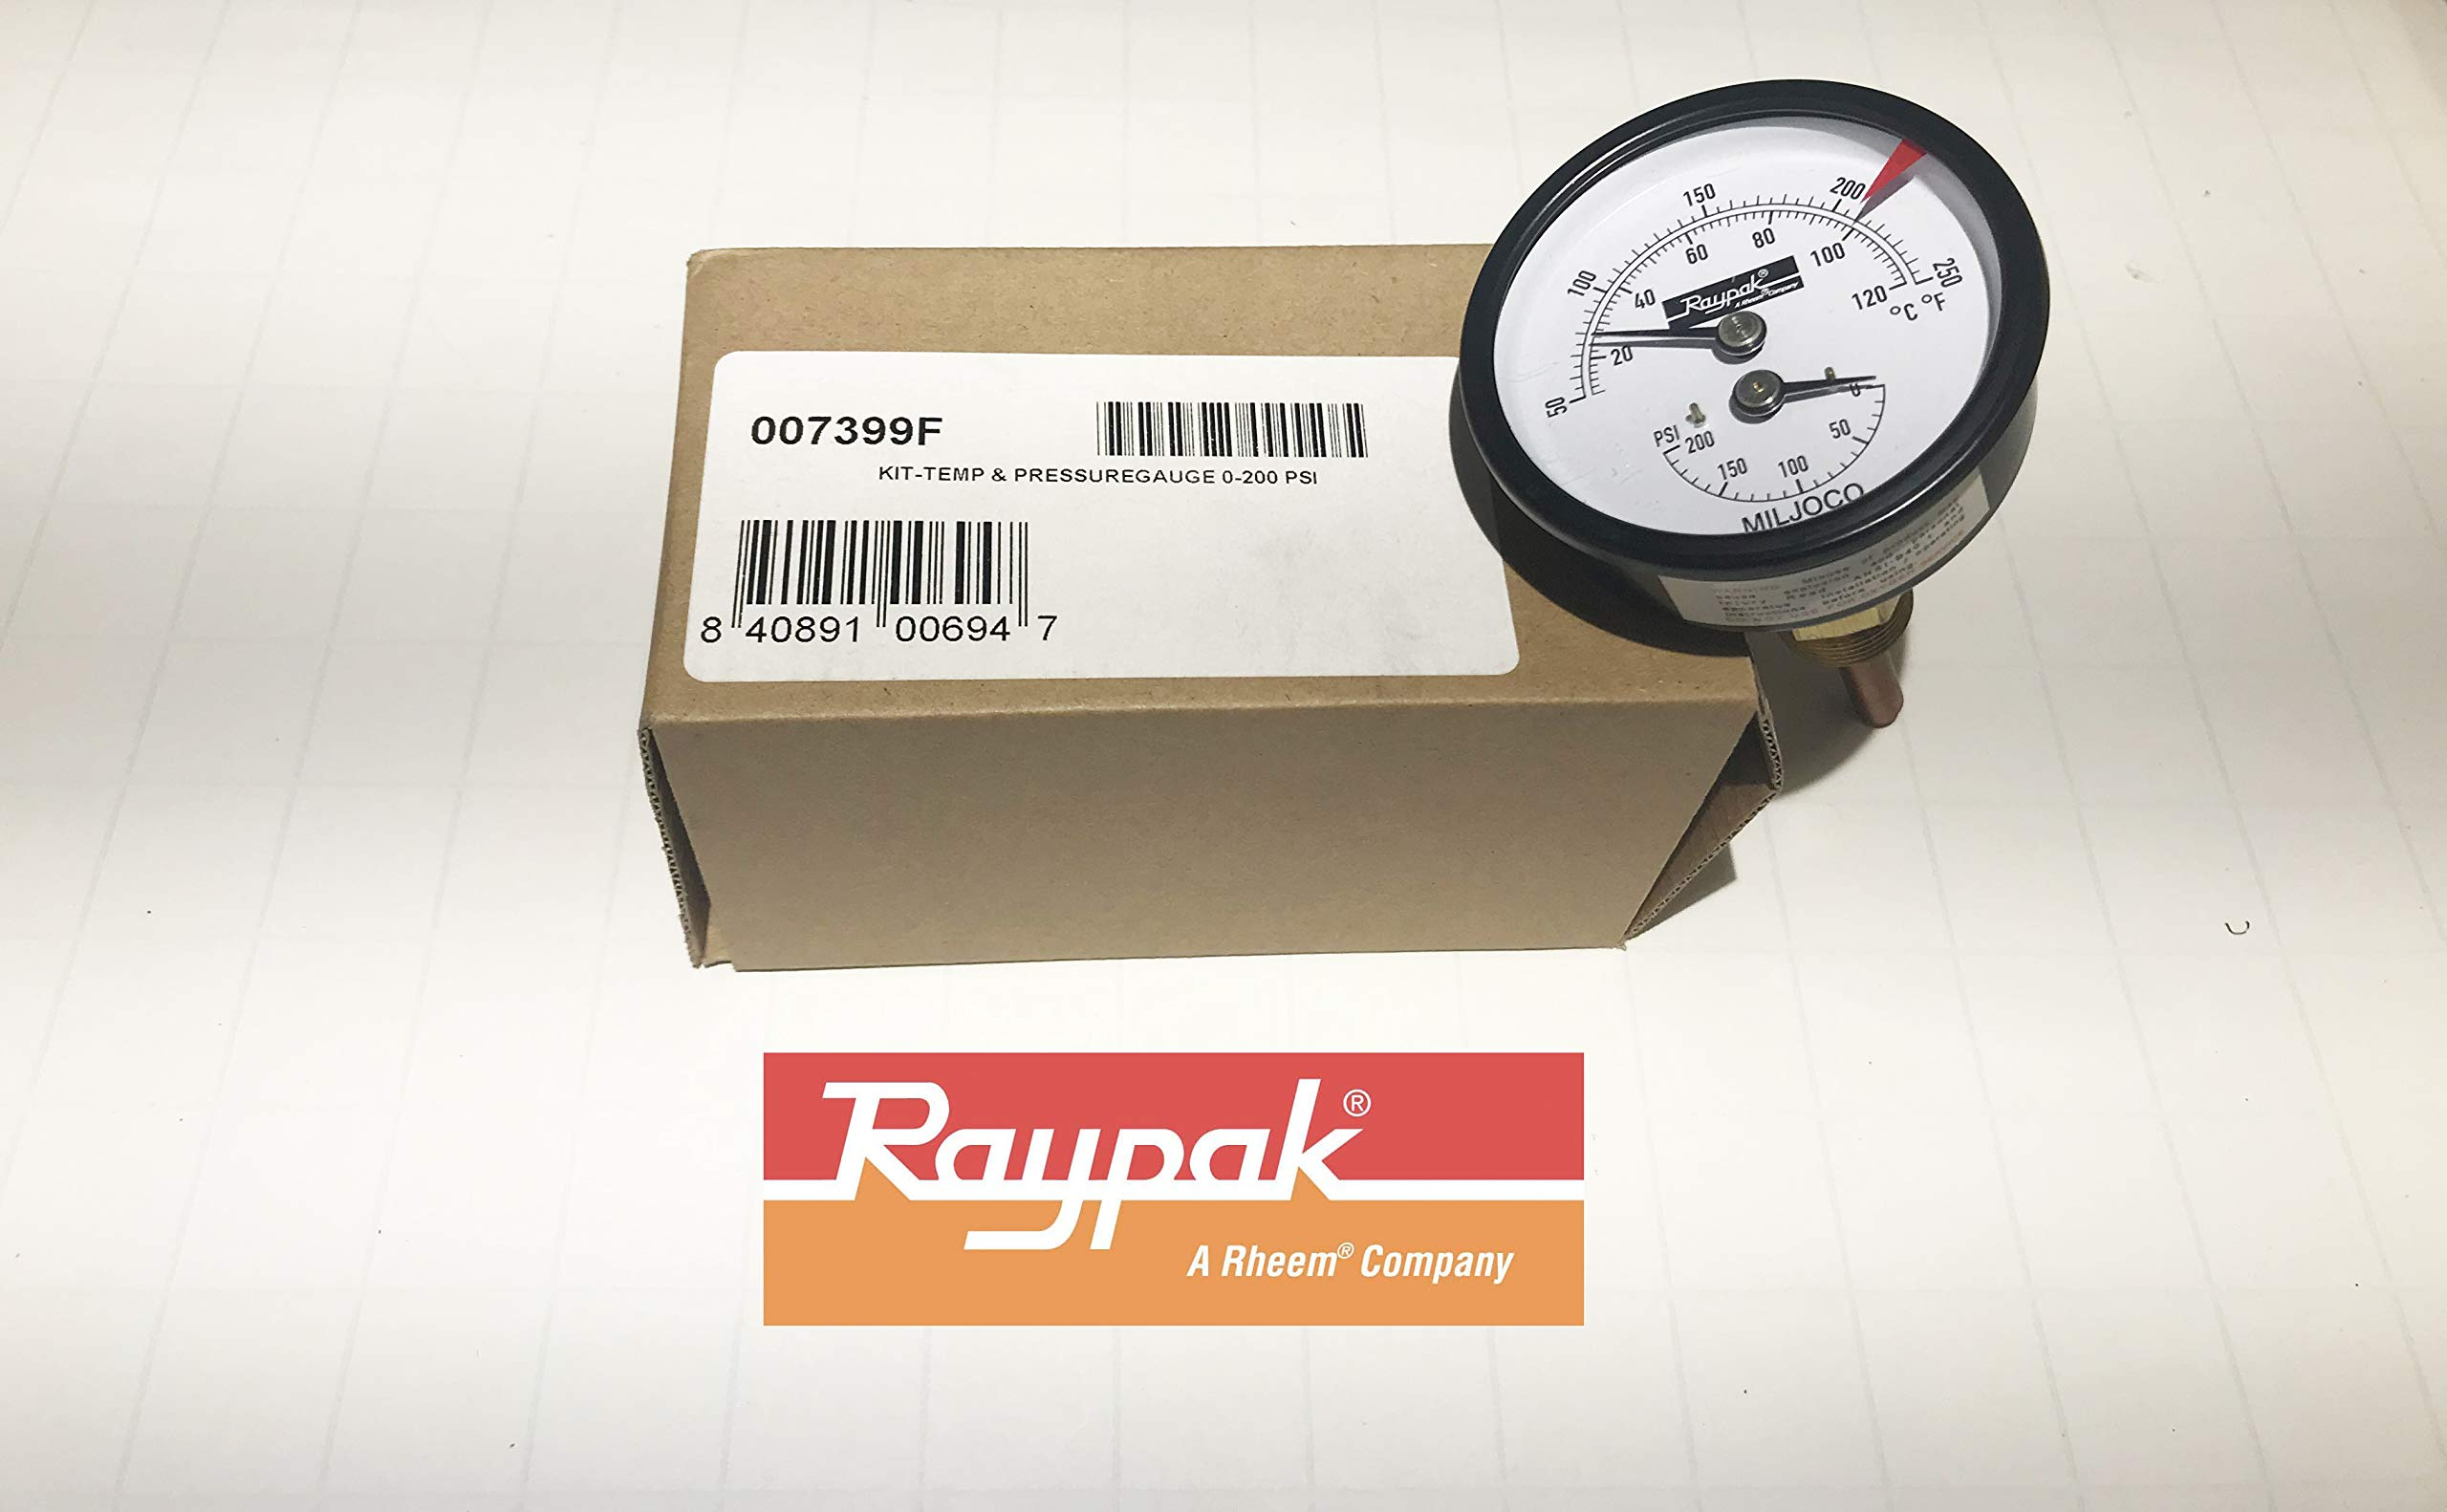 Raypak 007399F Temperature and Pressure Gauge Kit by Raypak